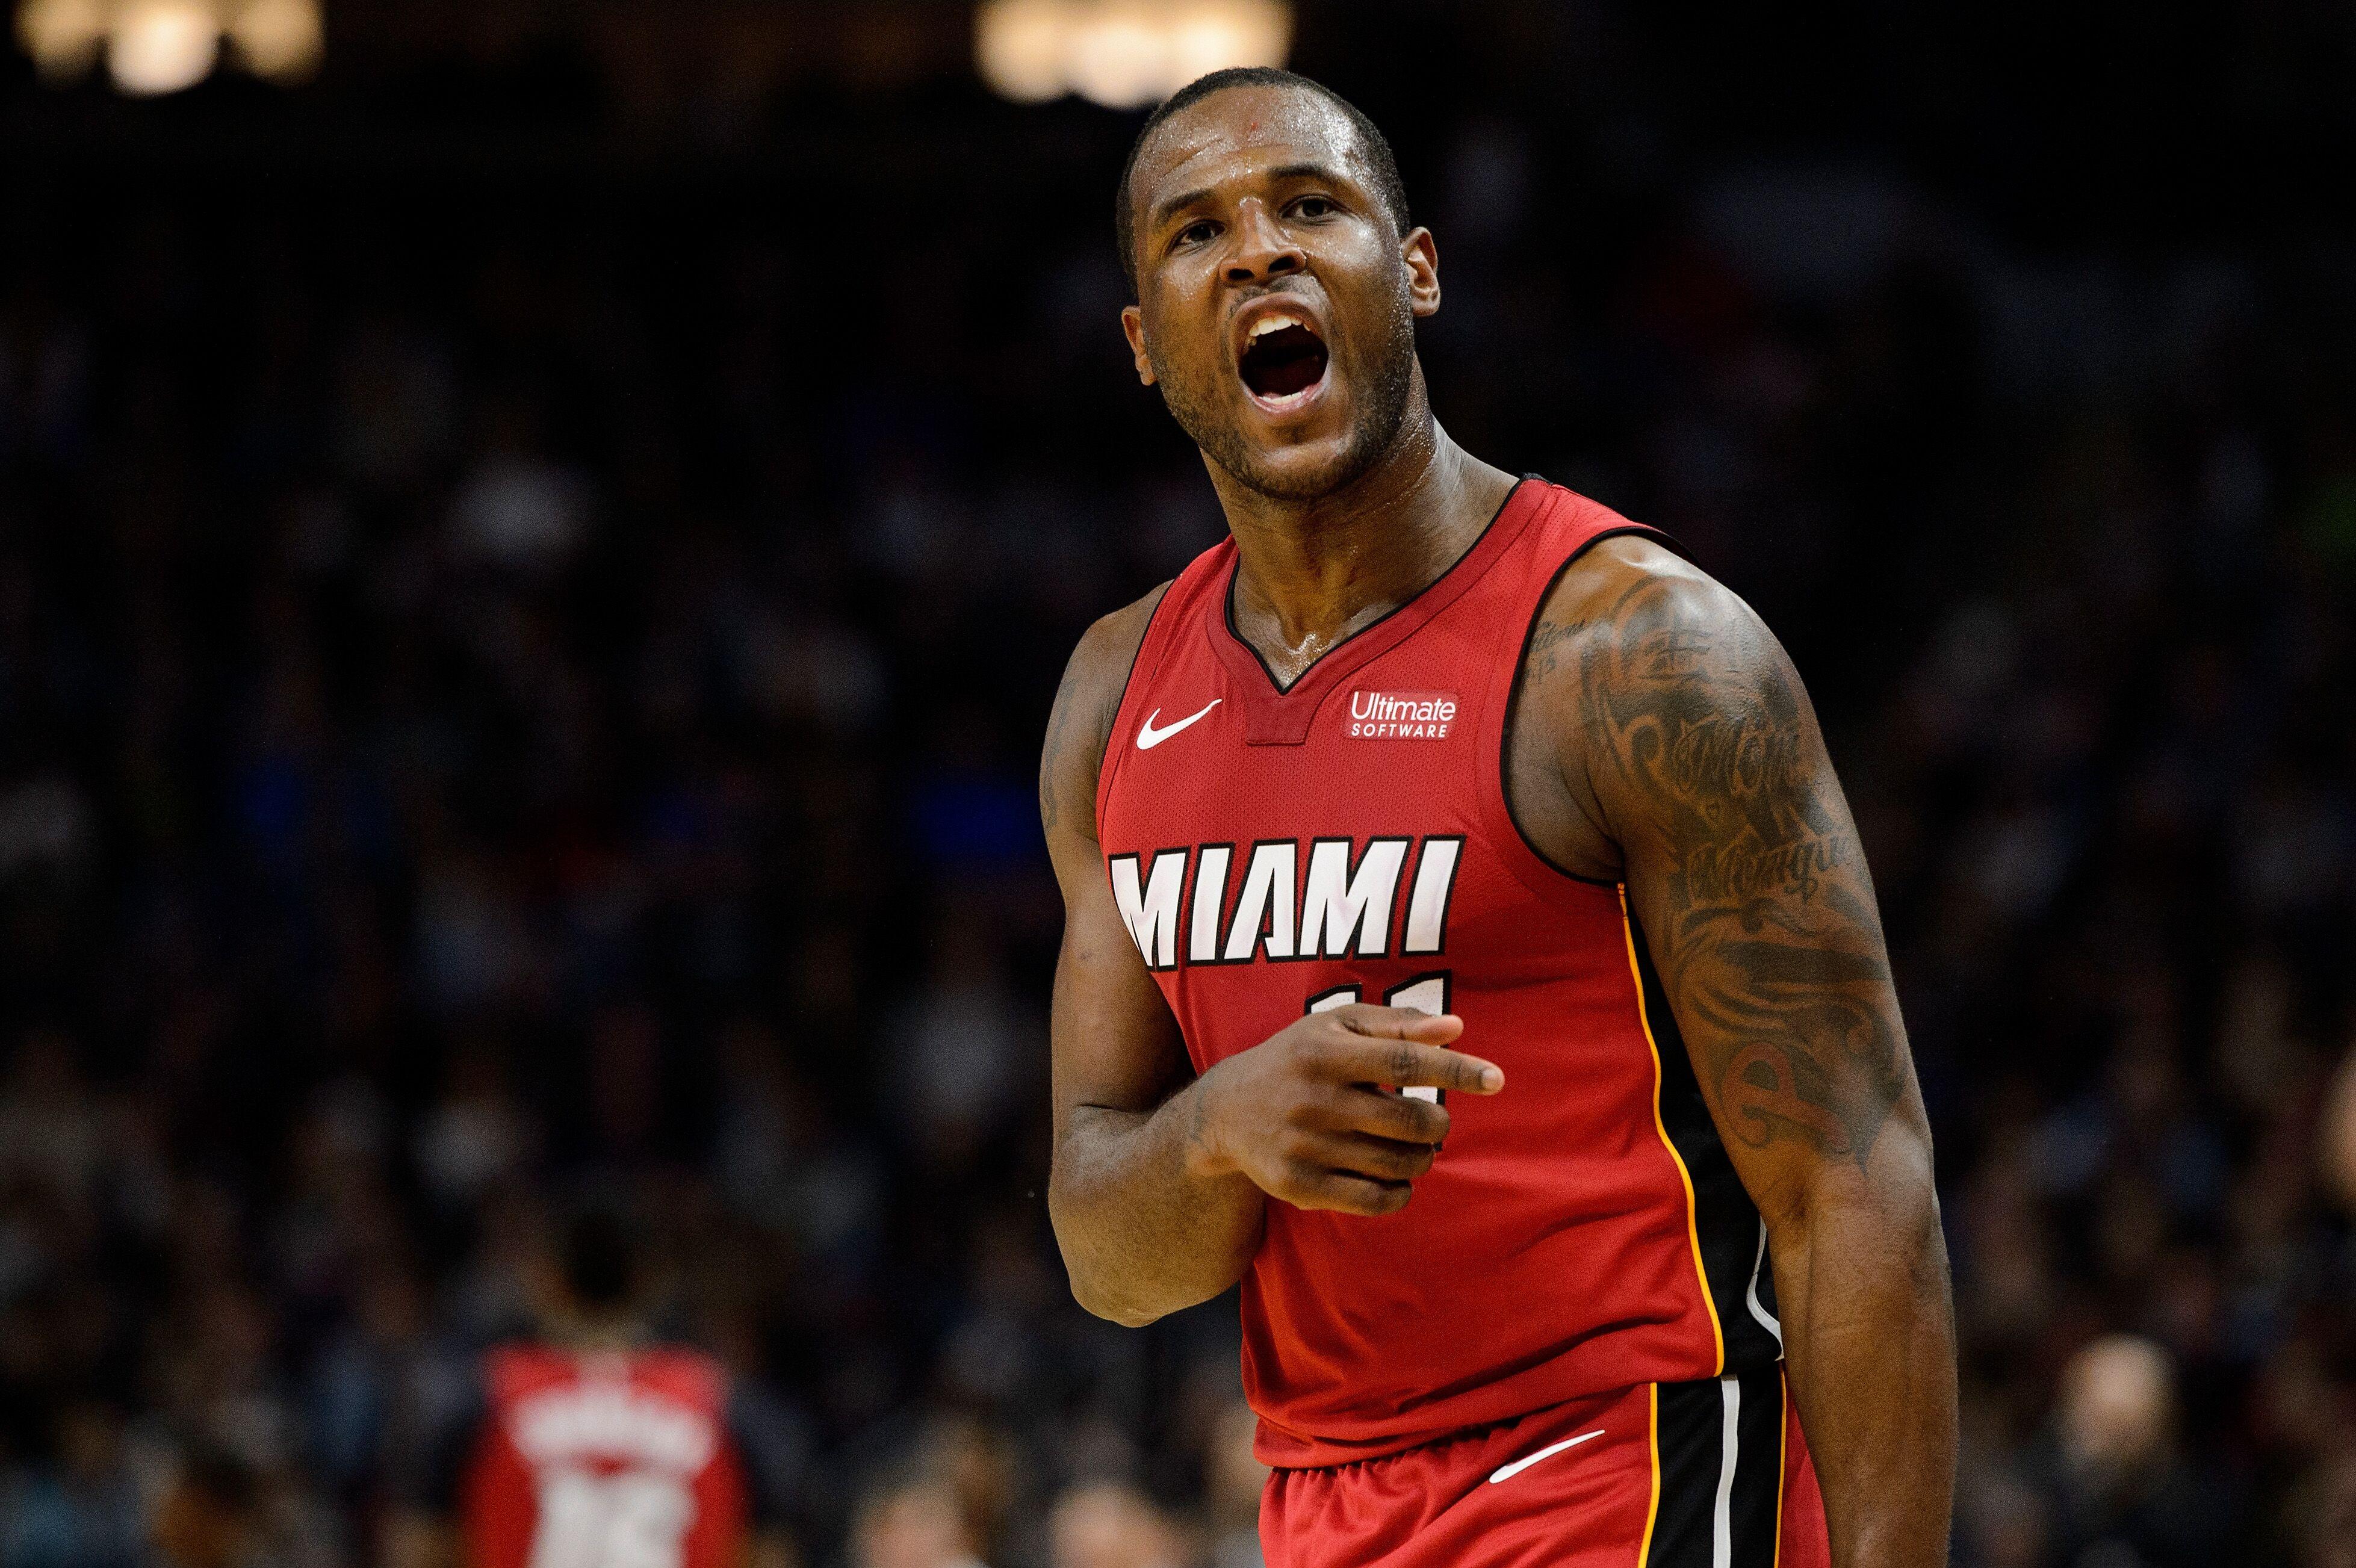 Nba Basketball Miami Heat Bedroom In: Miami Heat: 3 Goals For Dion Waiters In 2018-19 NBA Season